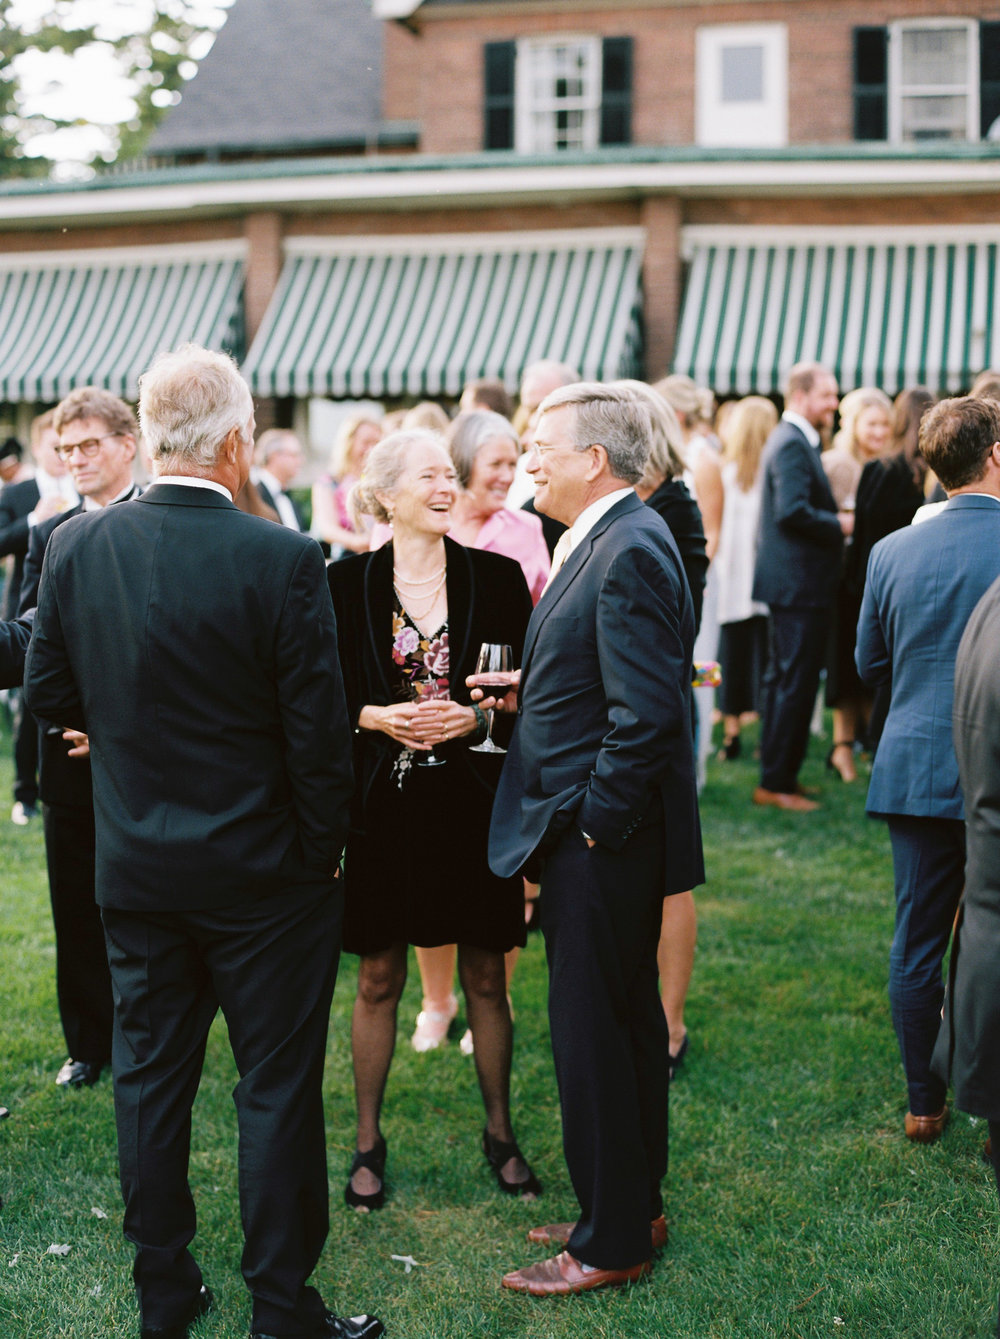 0610-Geneva-Ian-Wedding-Toronto Golf Club-When He Found Her-TorontoPhotographer.jpg